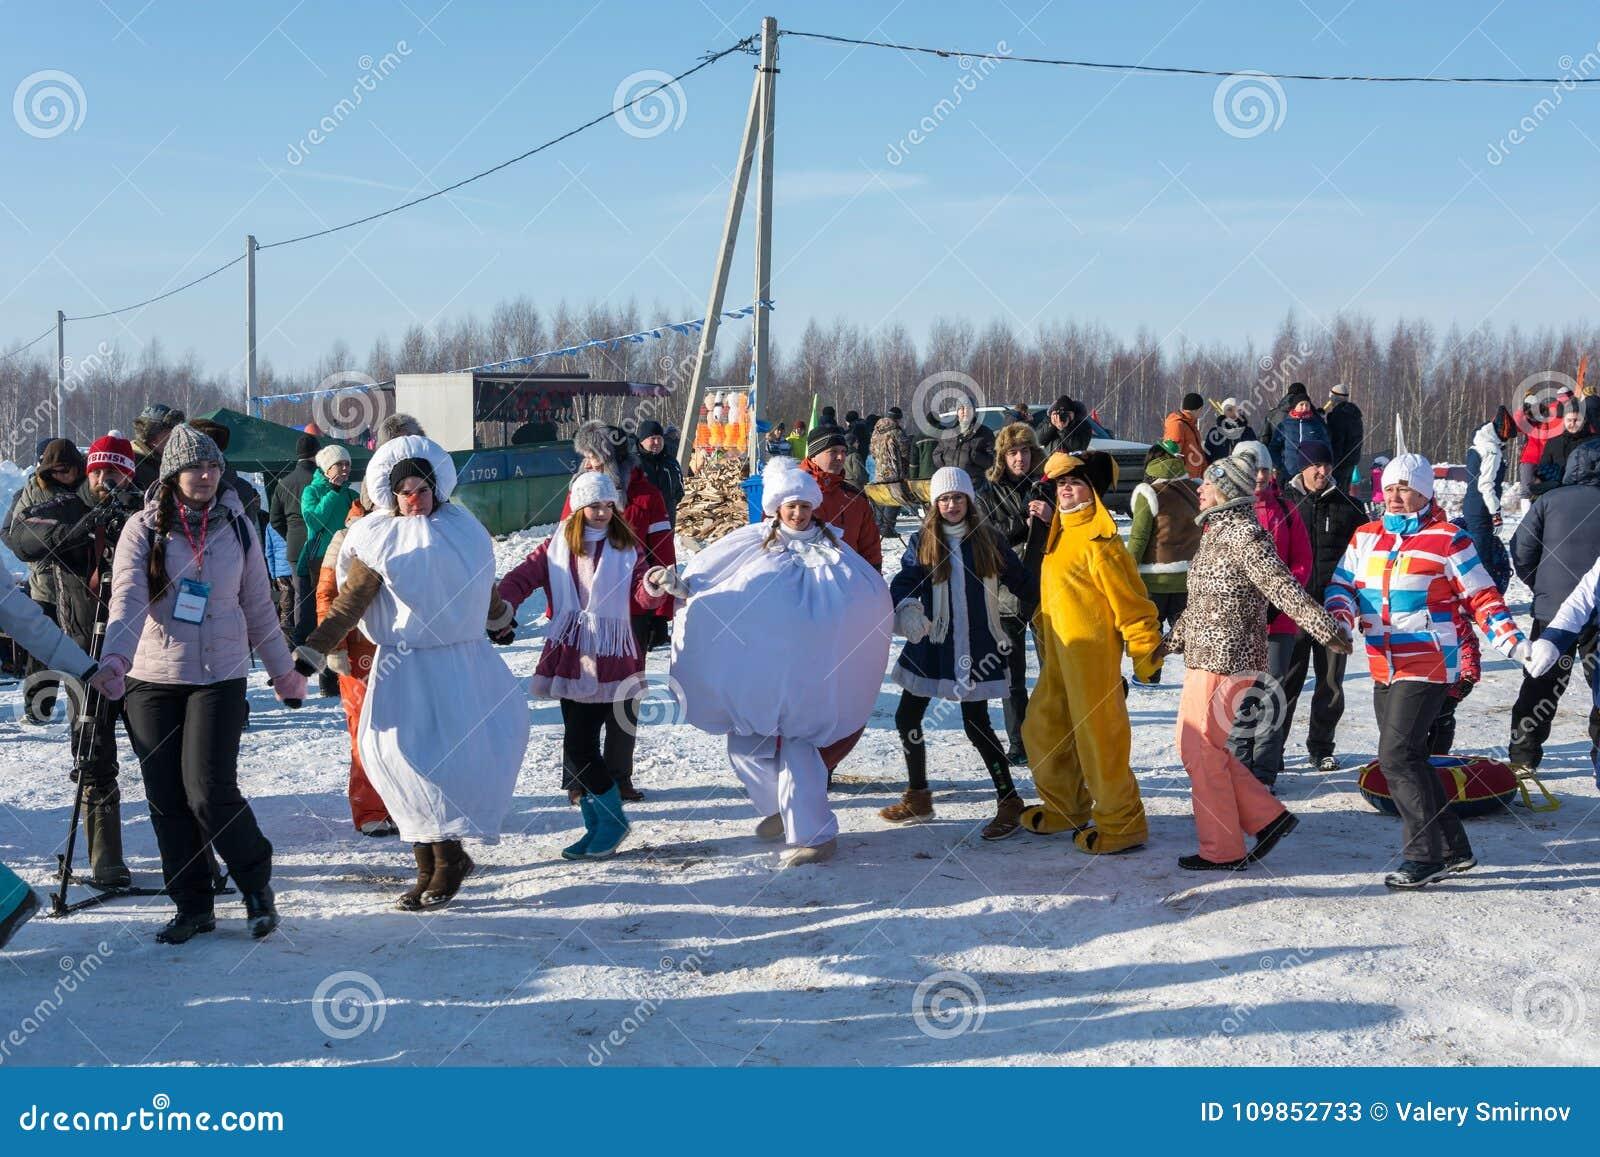 New 2018 in the Yaroslavl region